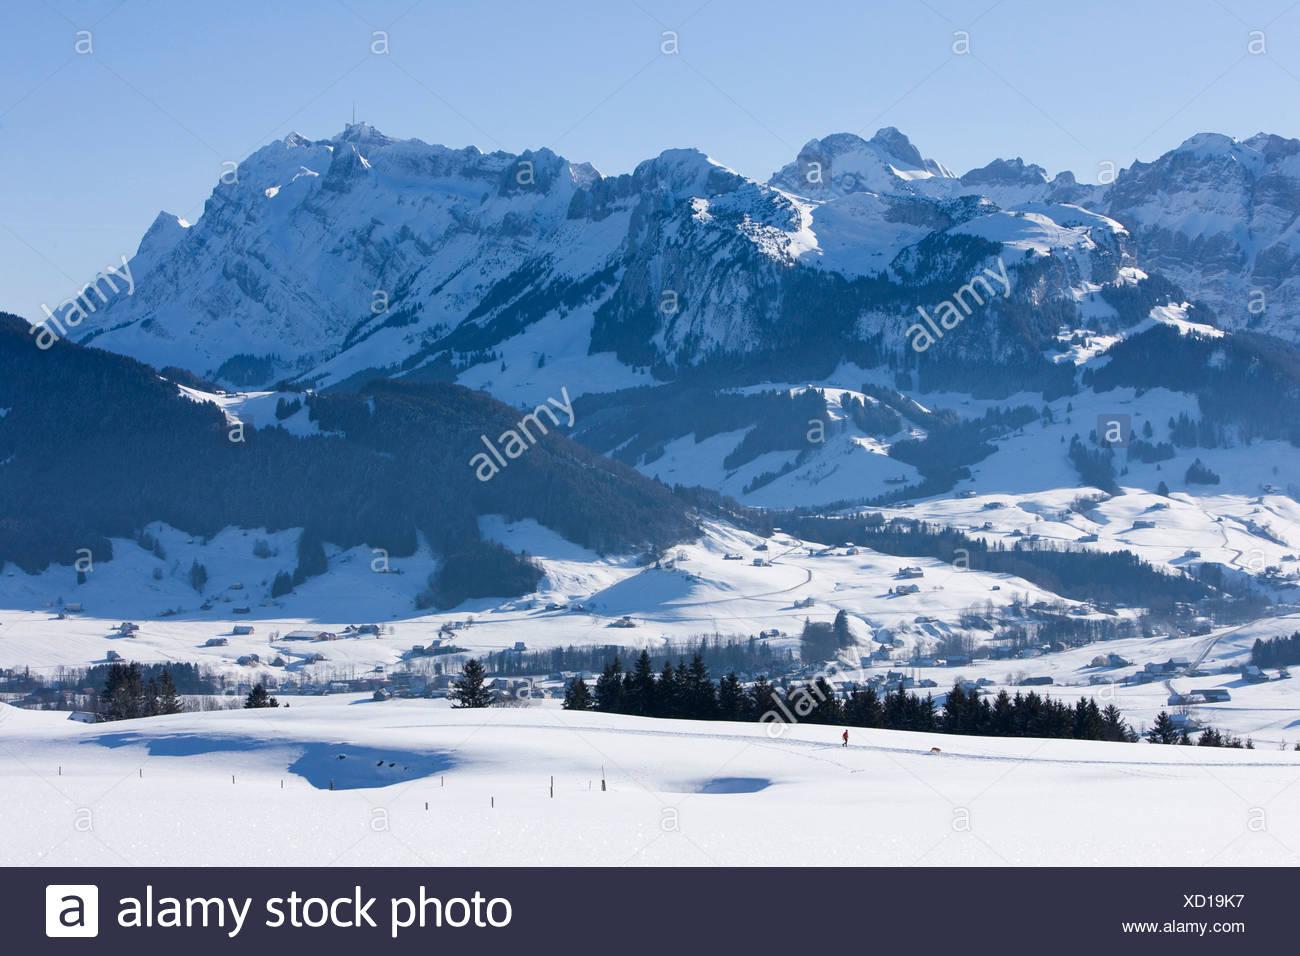 Säntis, Berg, Berge, Kanton Appenzell, Innerroden, Appenzell Bereich, Alpstein, Winter, Schweiz, Europa, Landschaft, land Stockbild